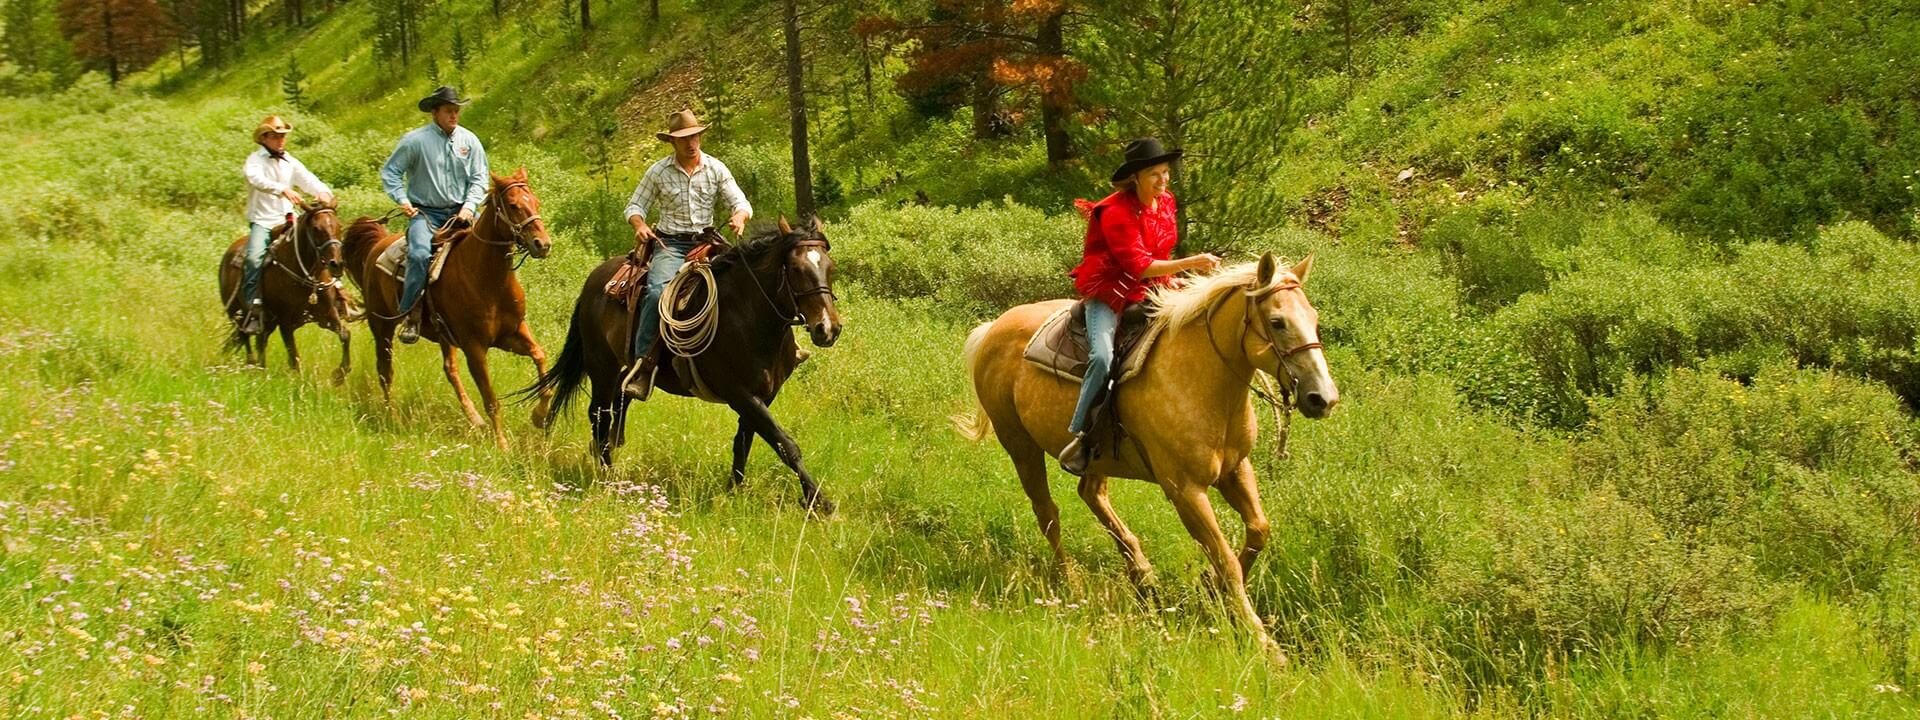 Best Horseback Riding Trails Mountain Adventures Grand County Colorado